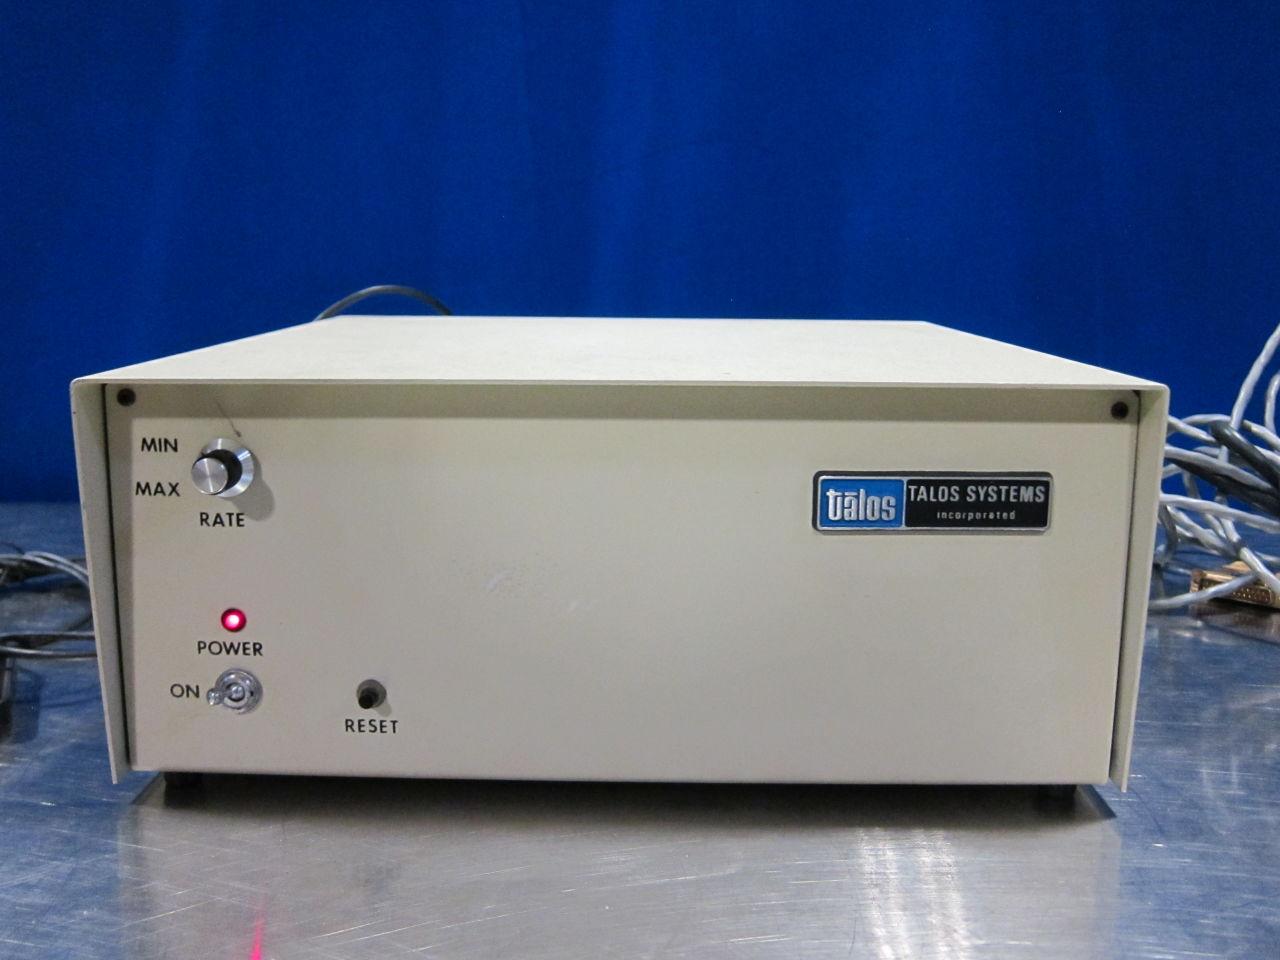 TALOS SYSTEMS S RP 622 B Console w/ Remote Lens